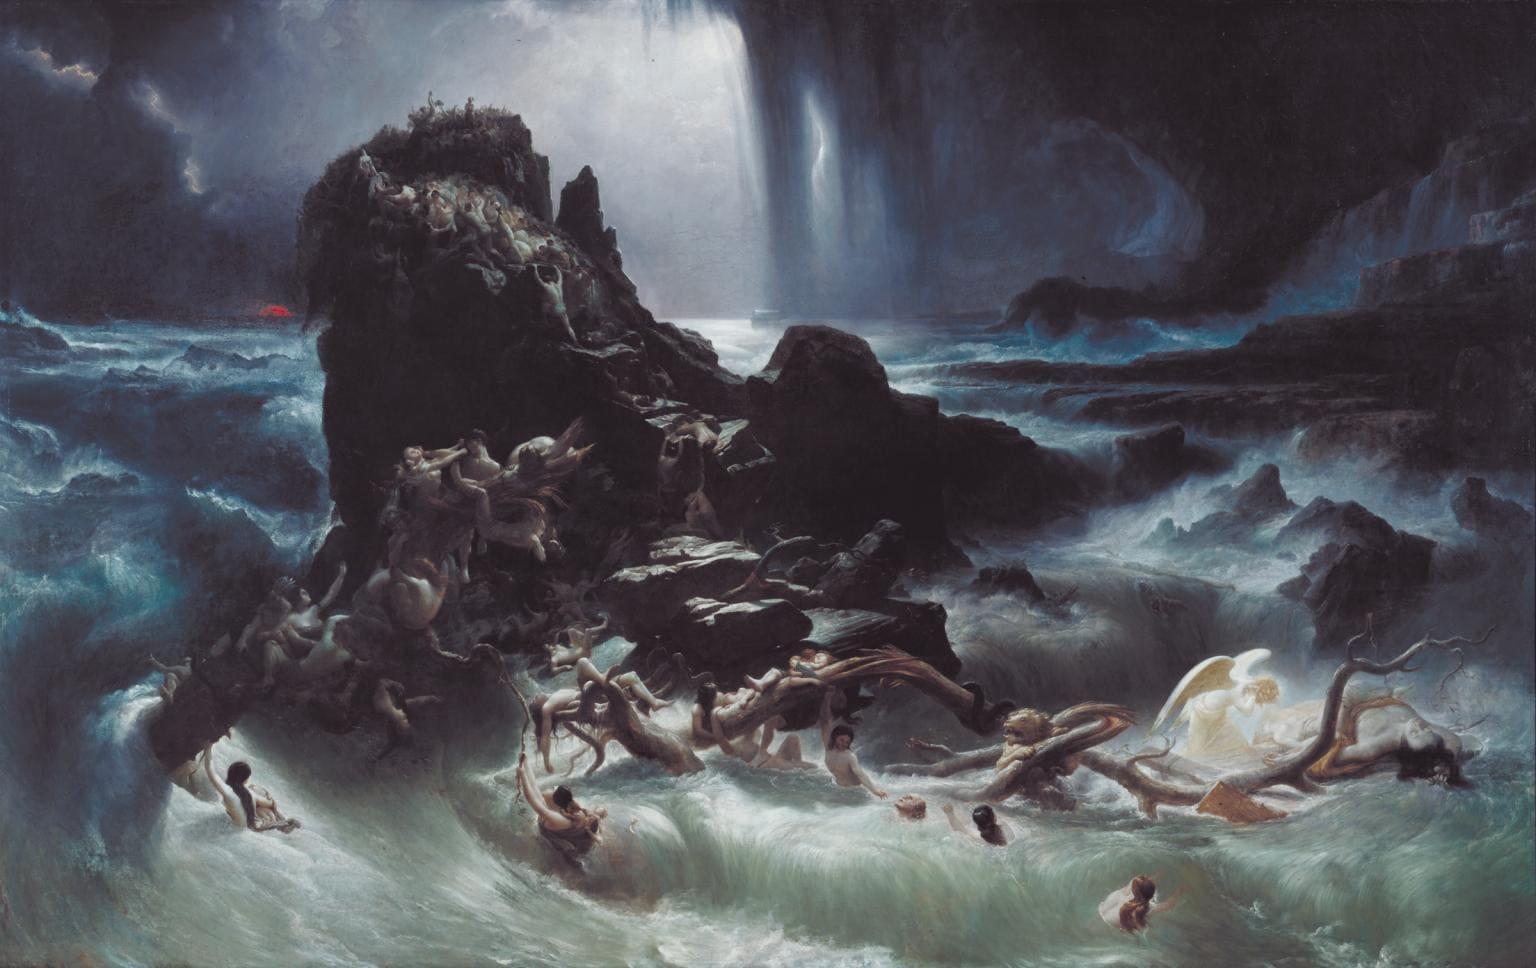 Déluge mer rocher morts noyade tempête Danby